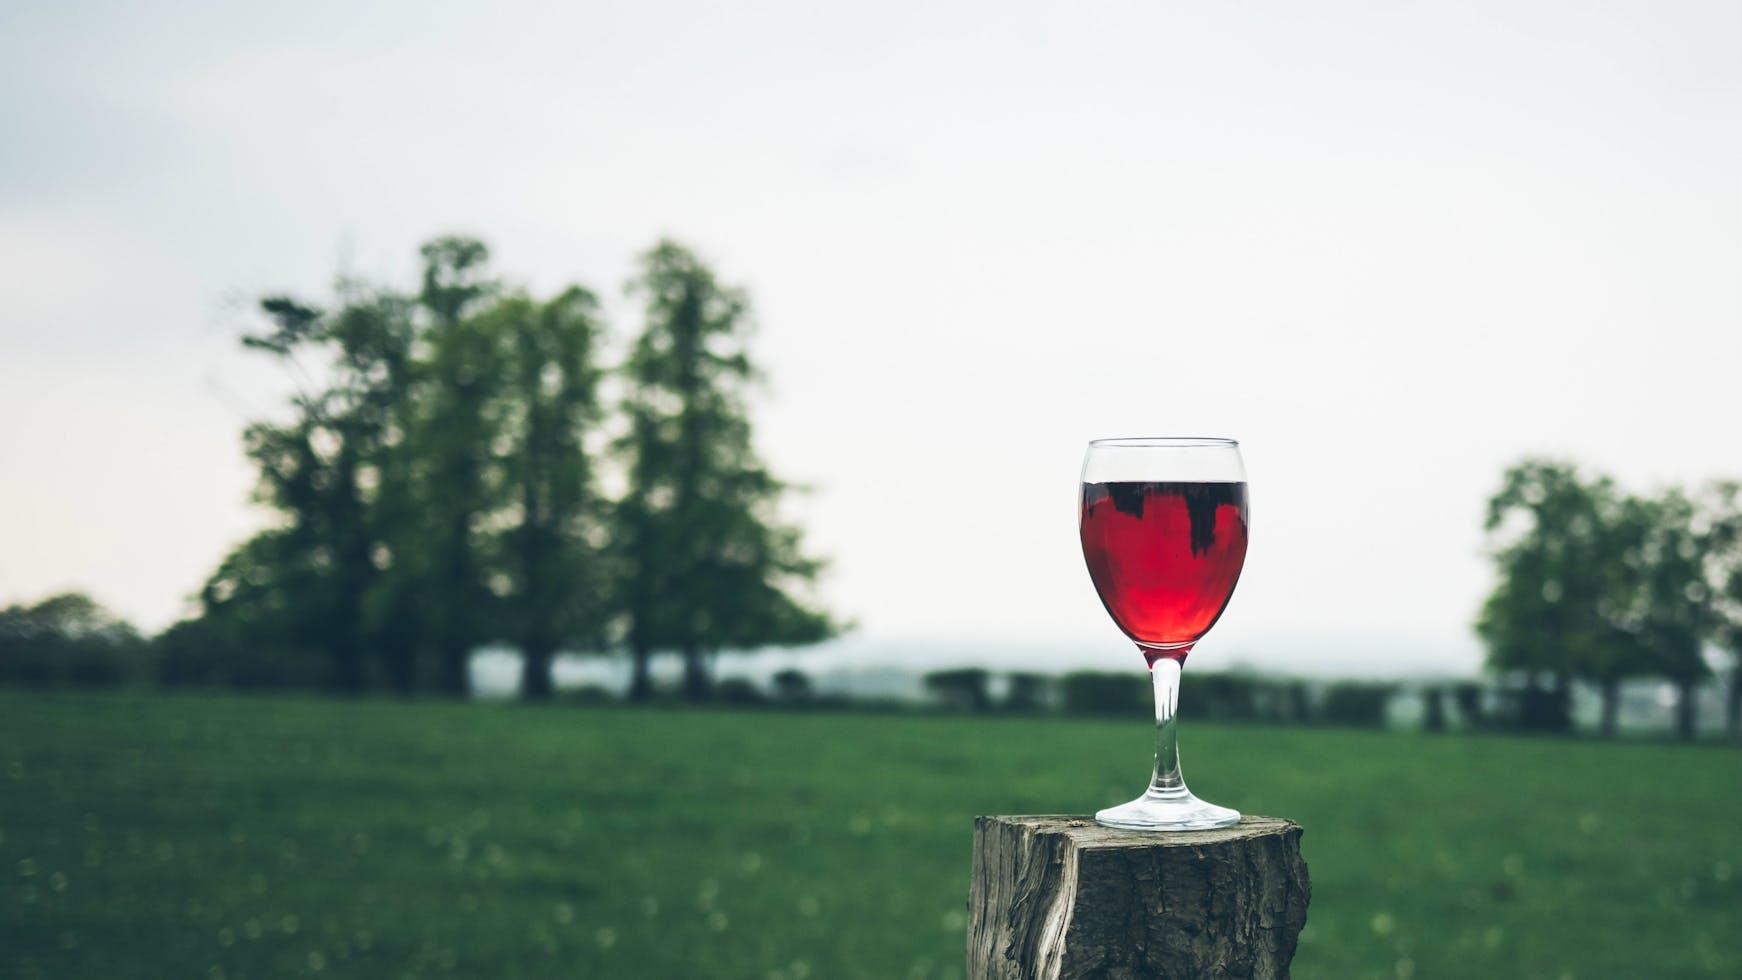 Water, Milk, and Wine